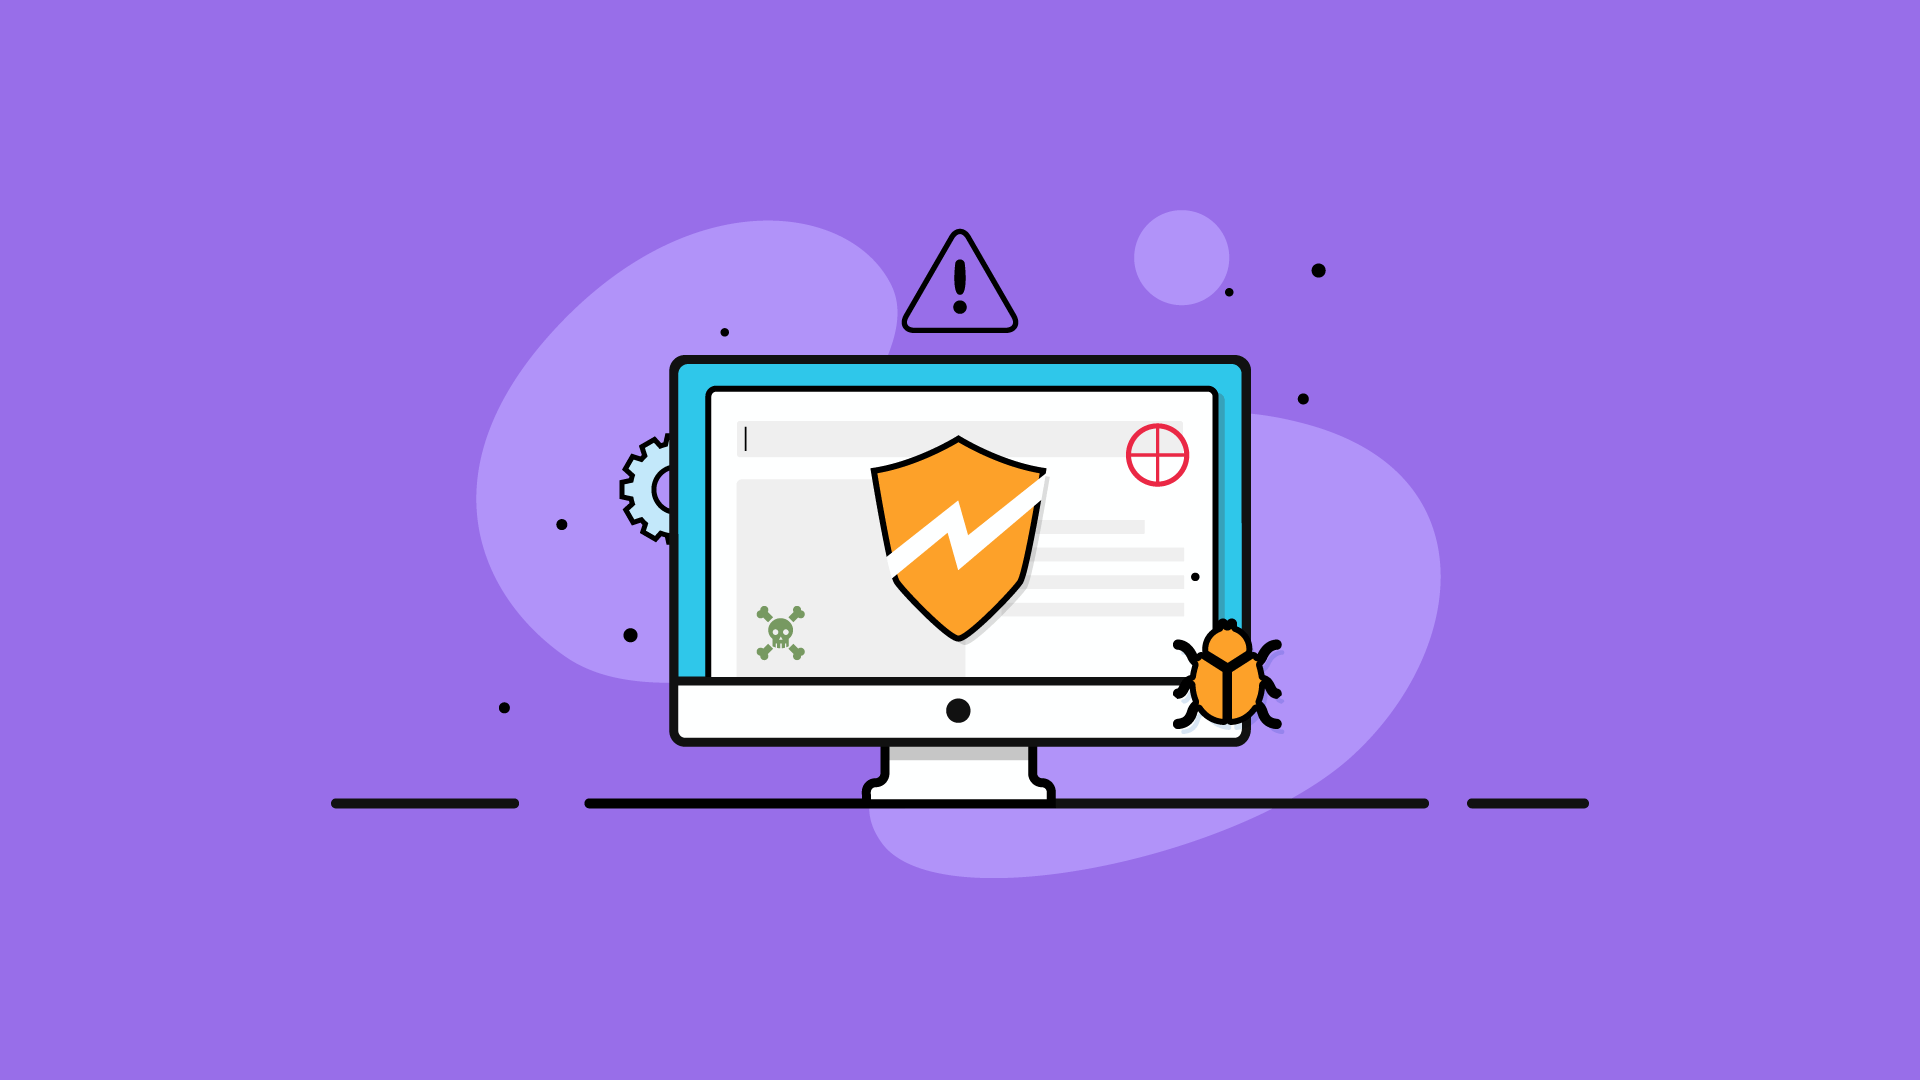 wordpress vulnerability report - security